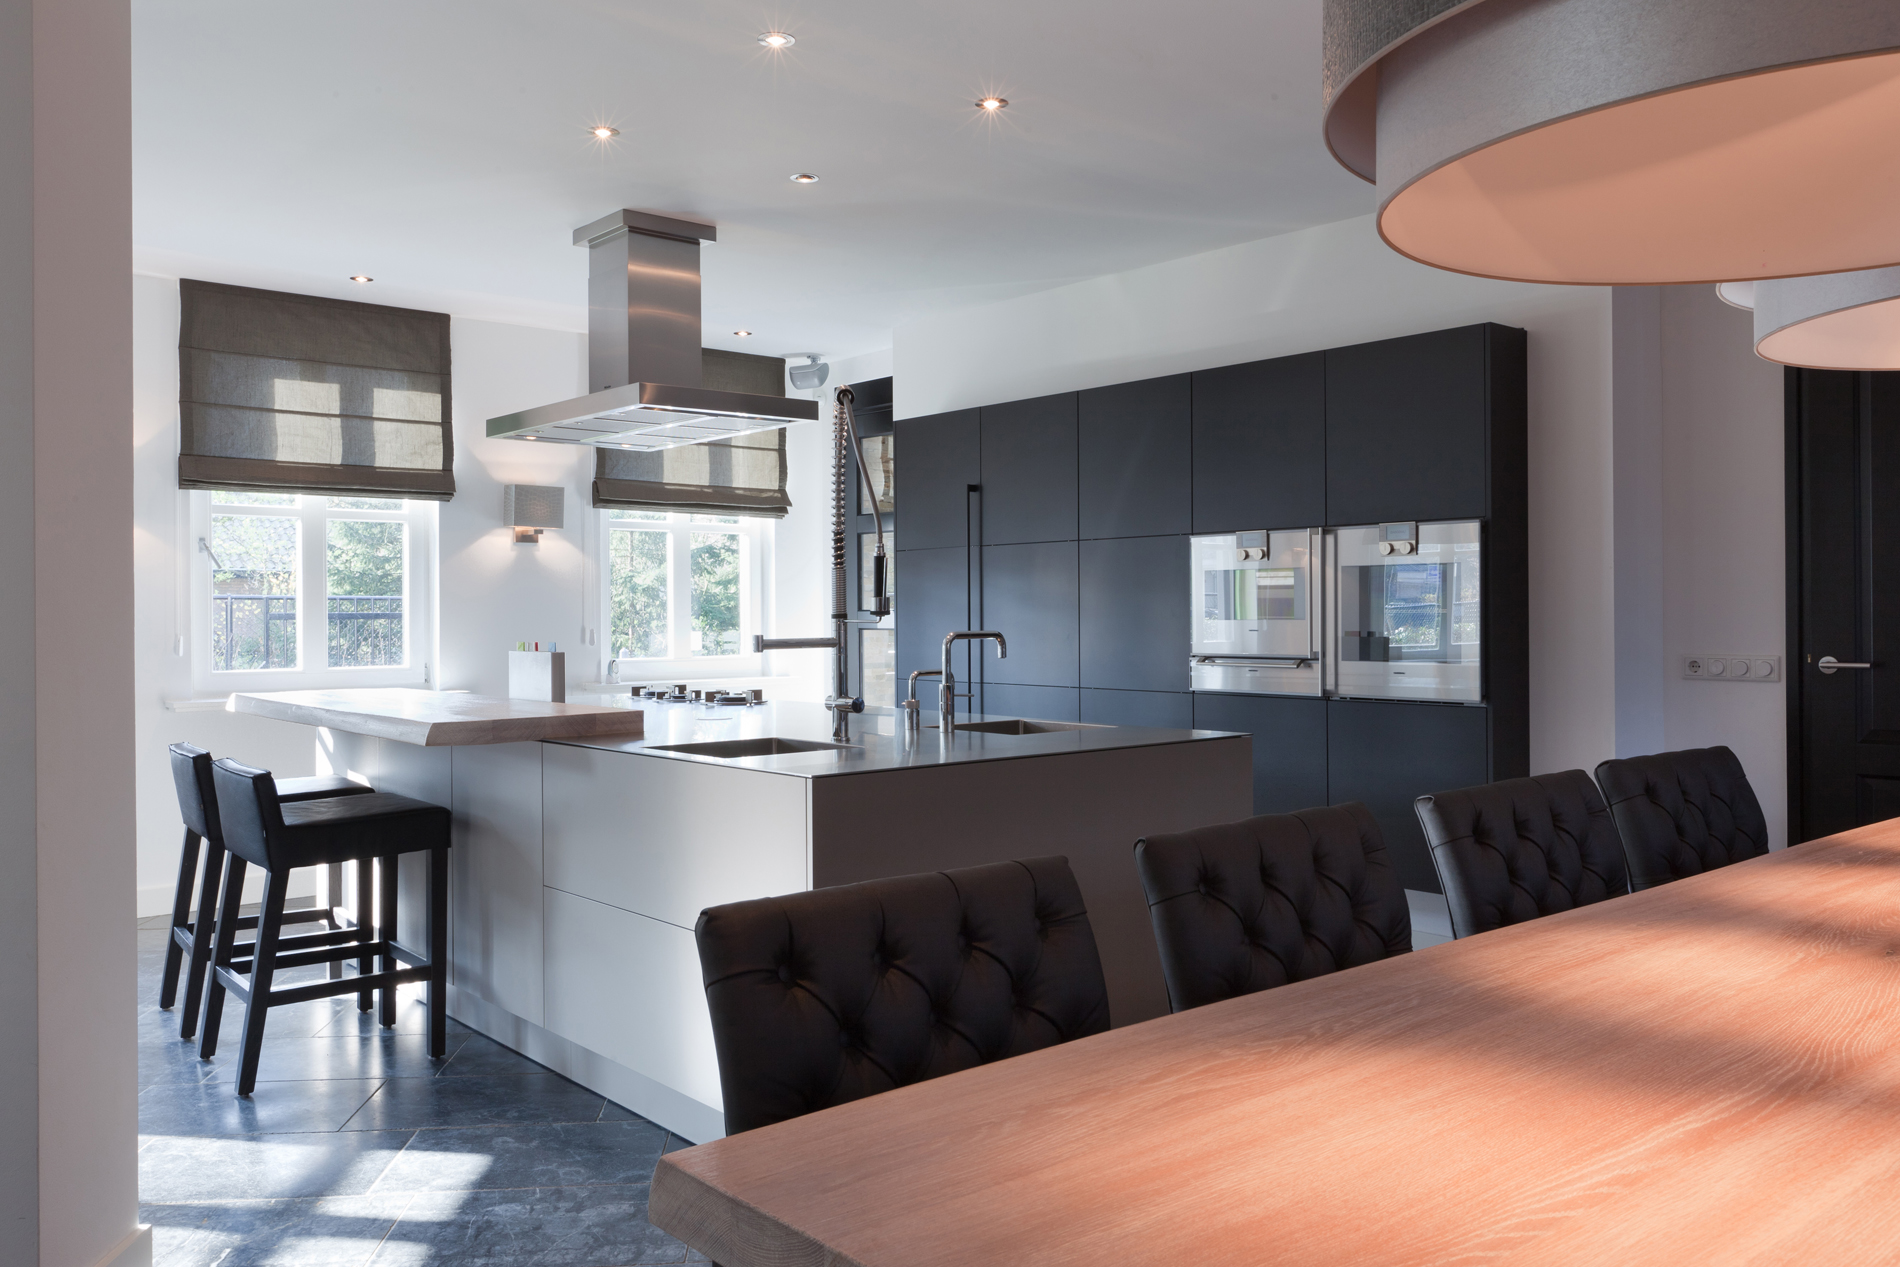 Home Design Keukens : Design keukens aswa keukens